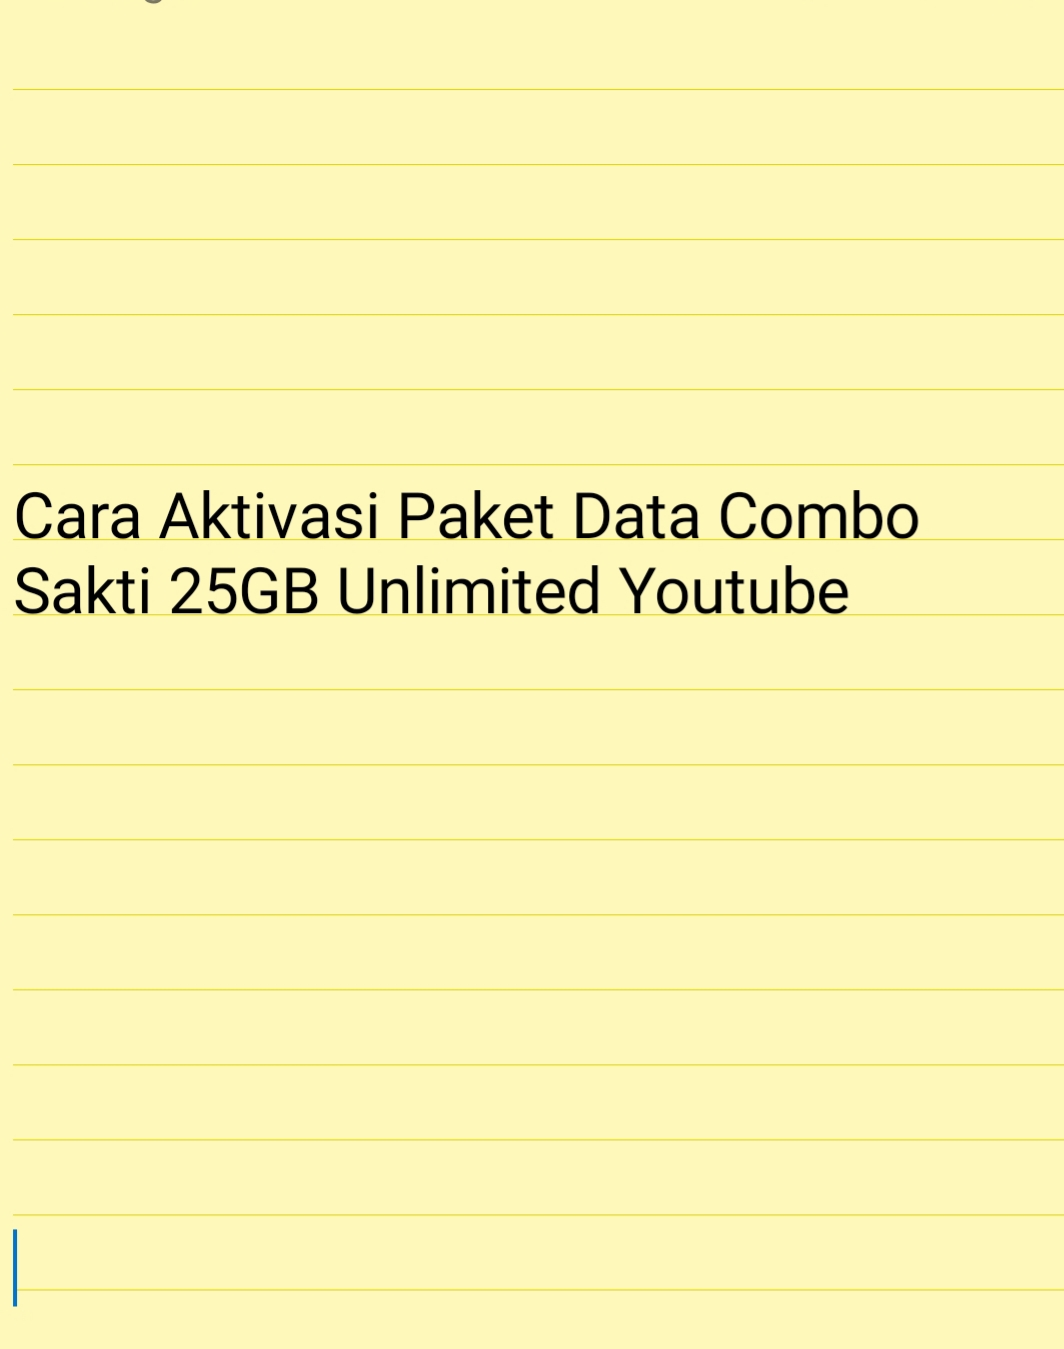 Cara Beli Paket Internet Combo Sakti Telkomsel  Cara Beli Paket Internet Combo Sakti Telkomsel 25GB Unlimited Youtube